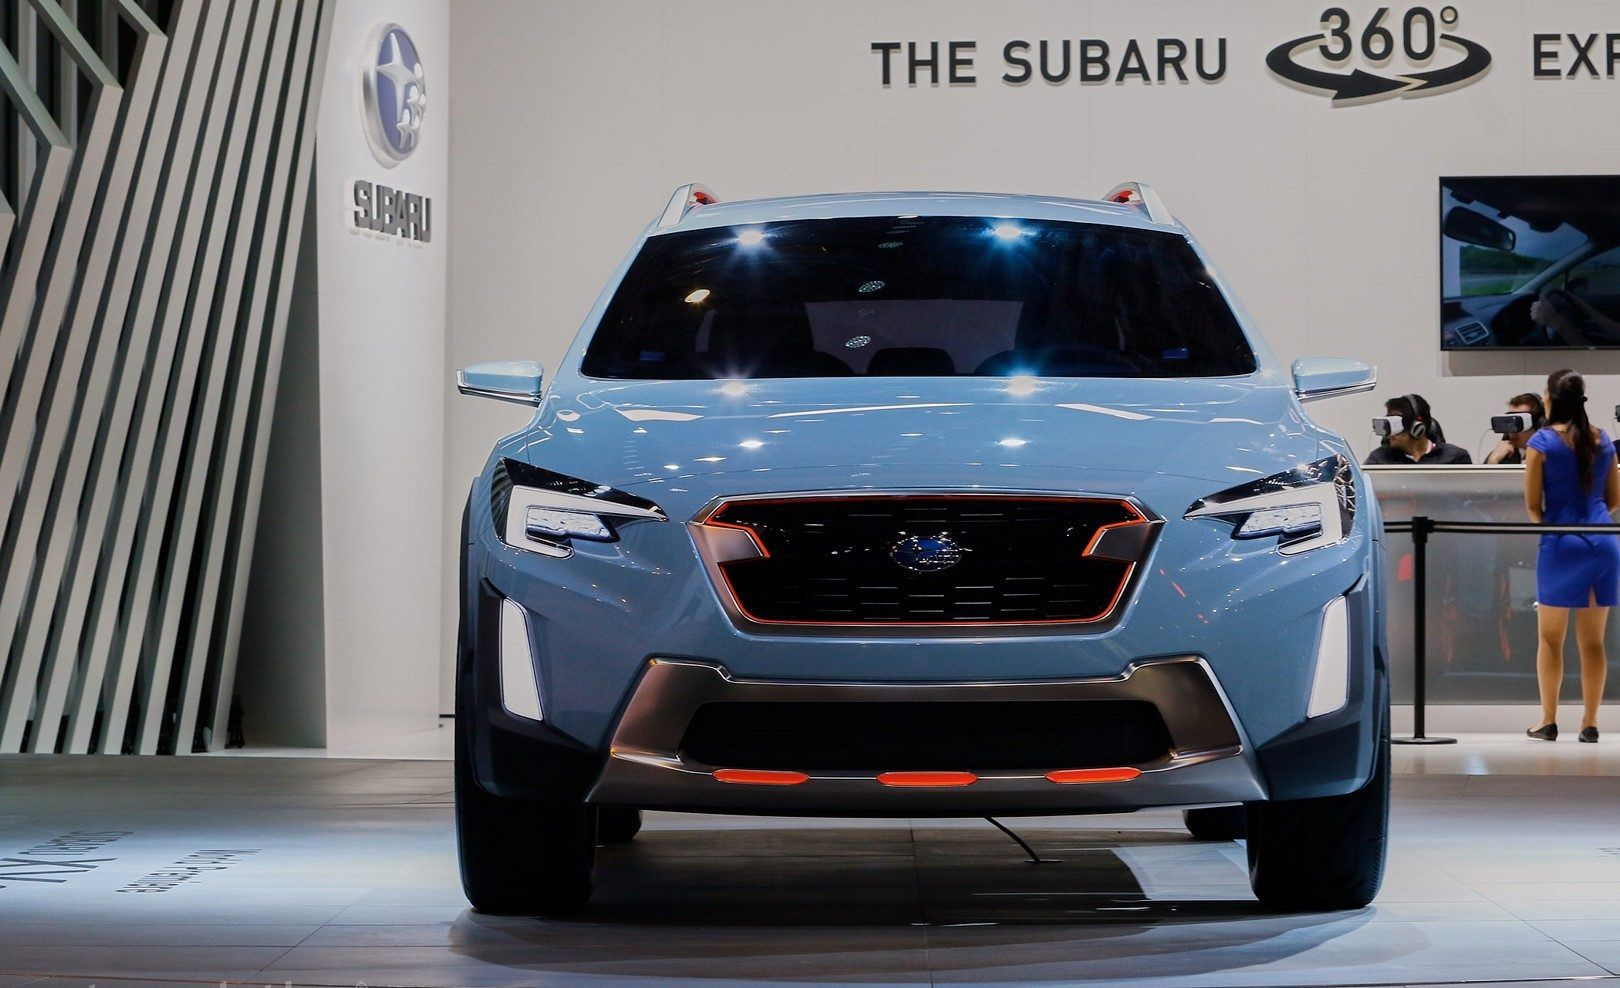 2017 Subaru Crosstrek Xv Specs Price Design Http Pistoncars